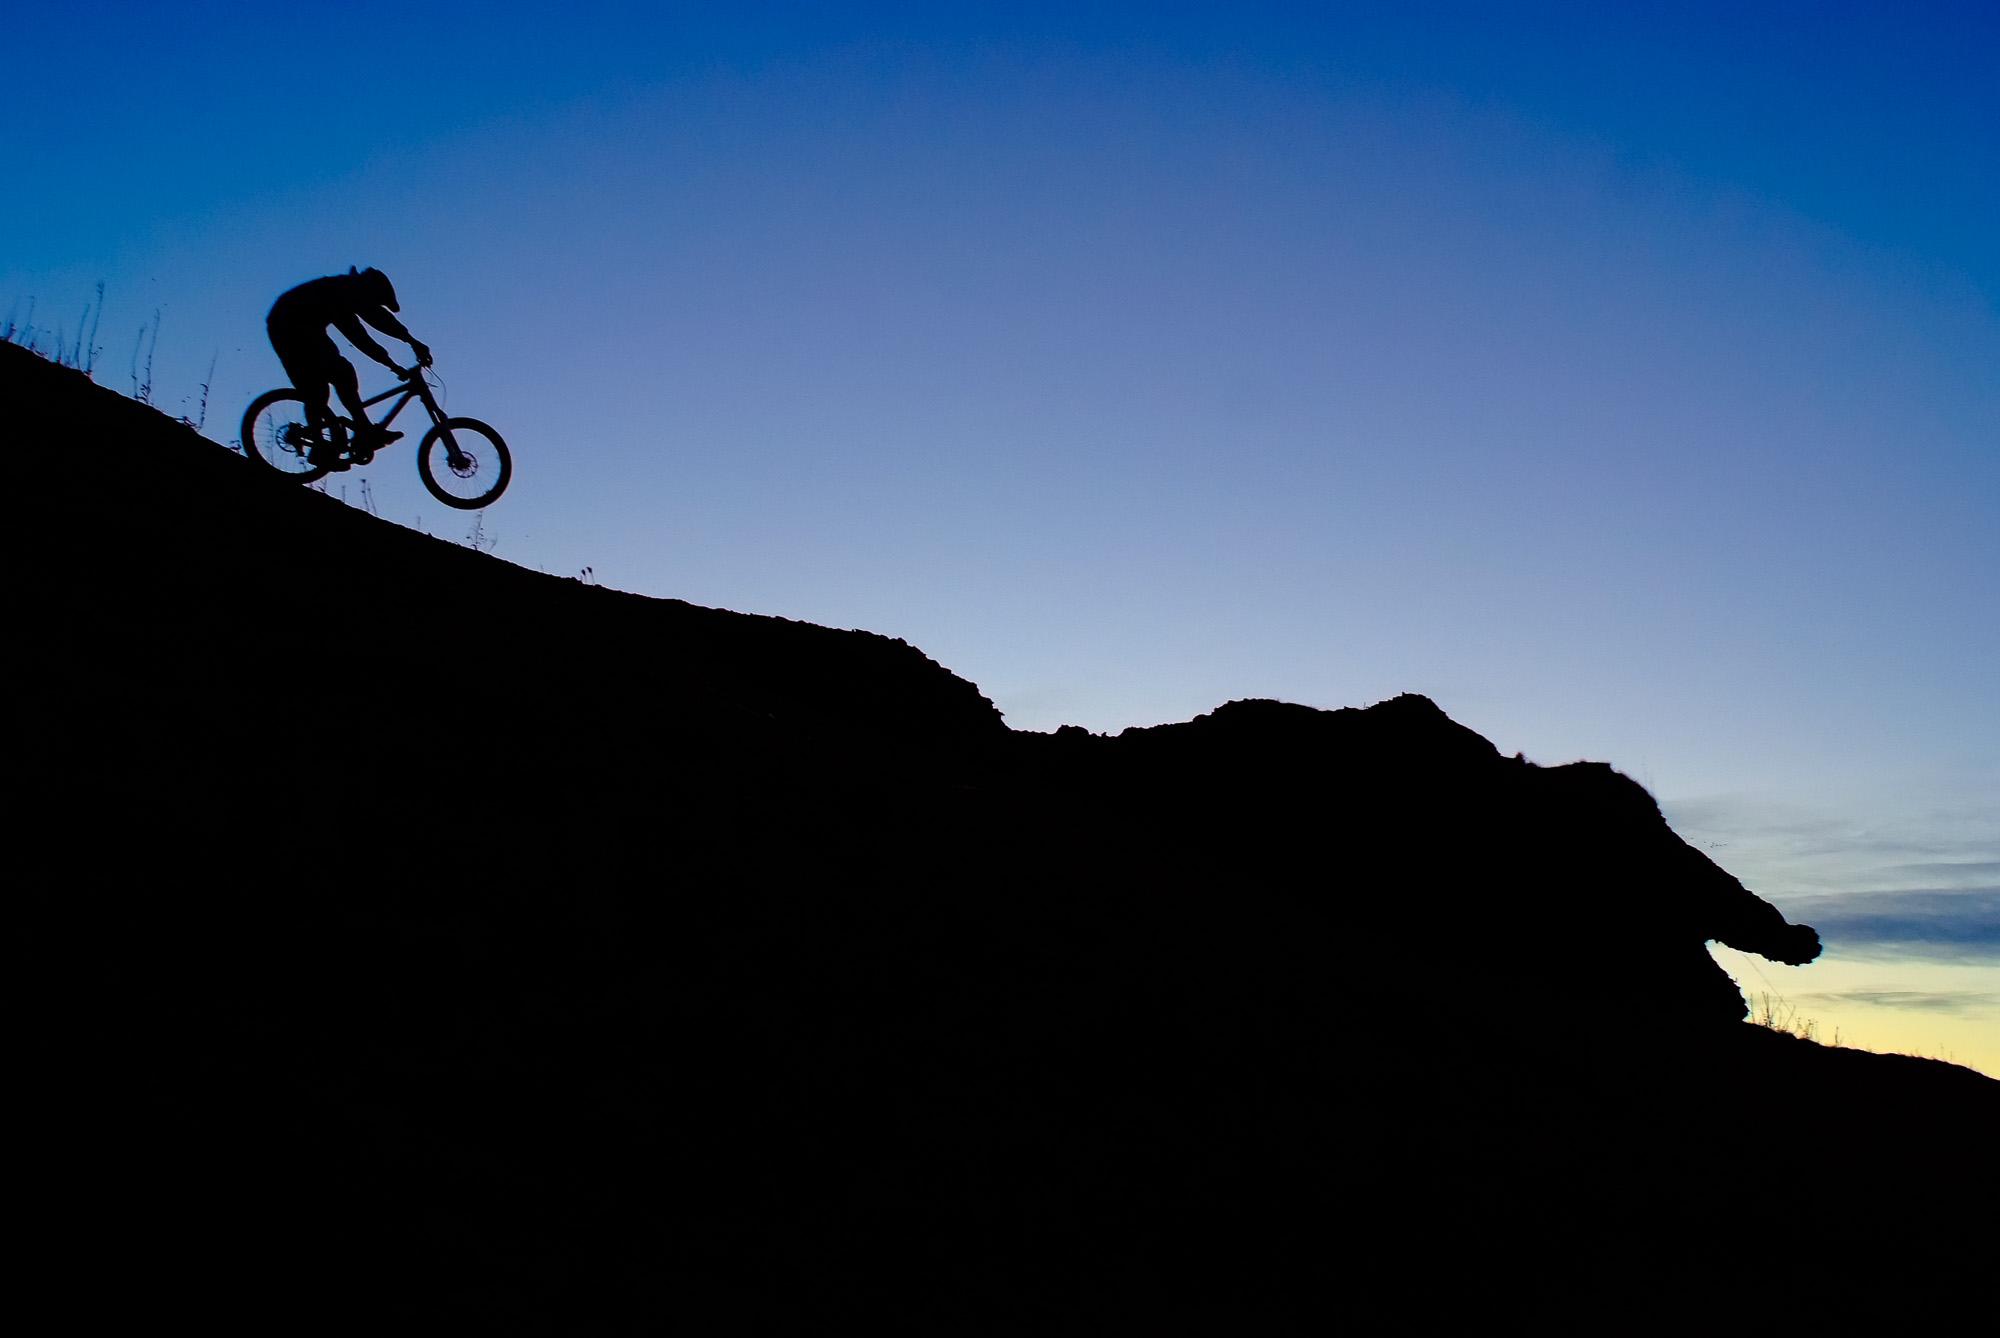 Riding ridgelines on the Banshee Legend. Sunset silhouette above Broxburn